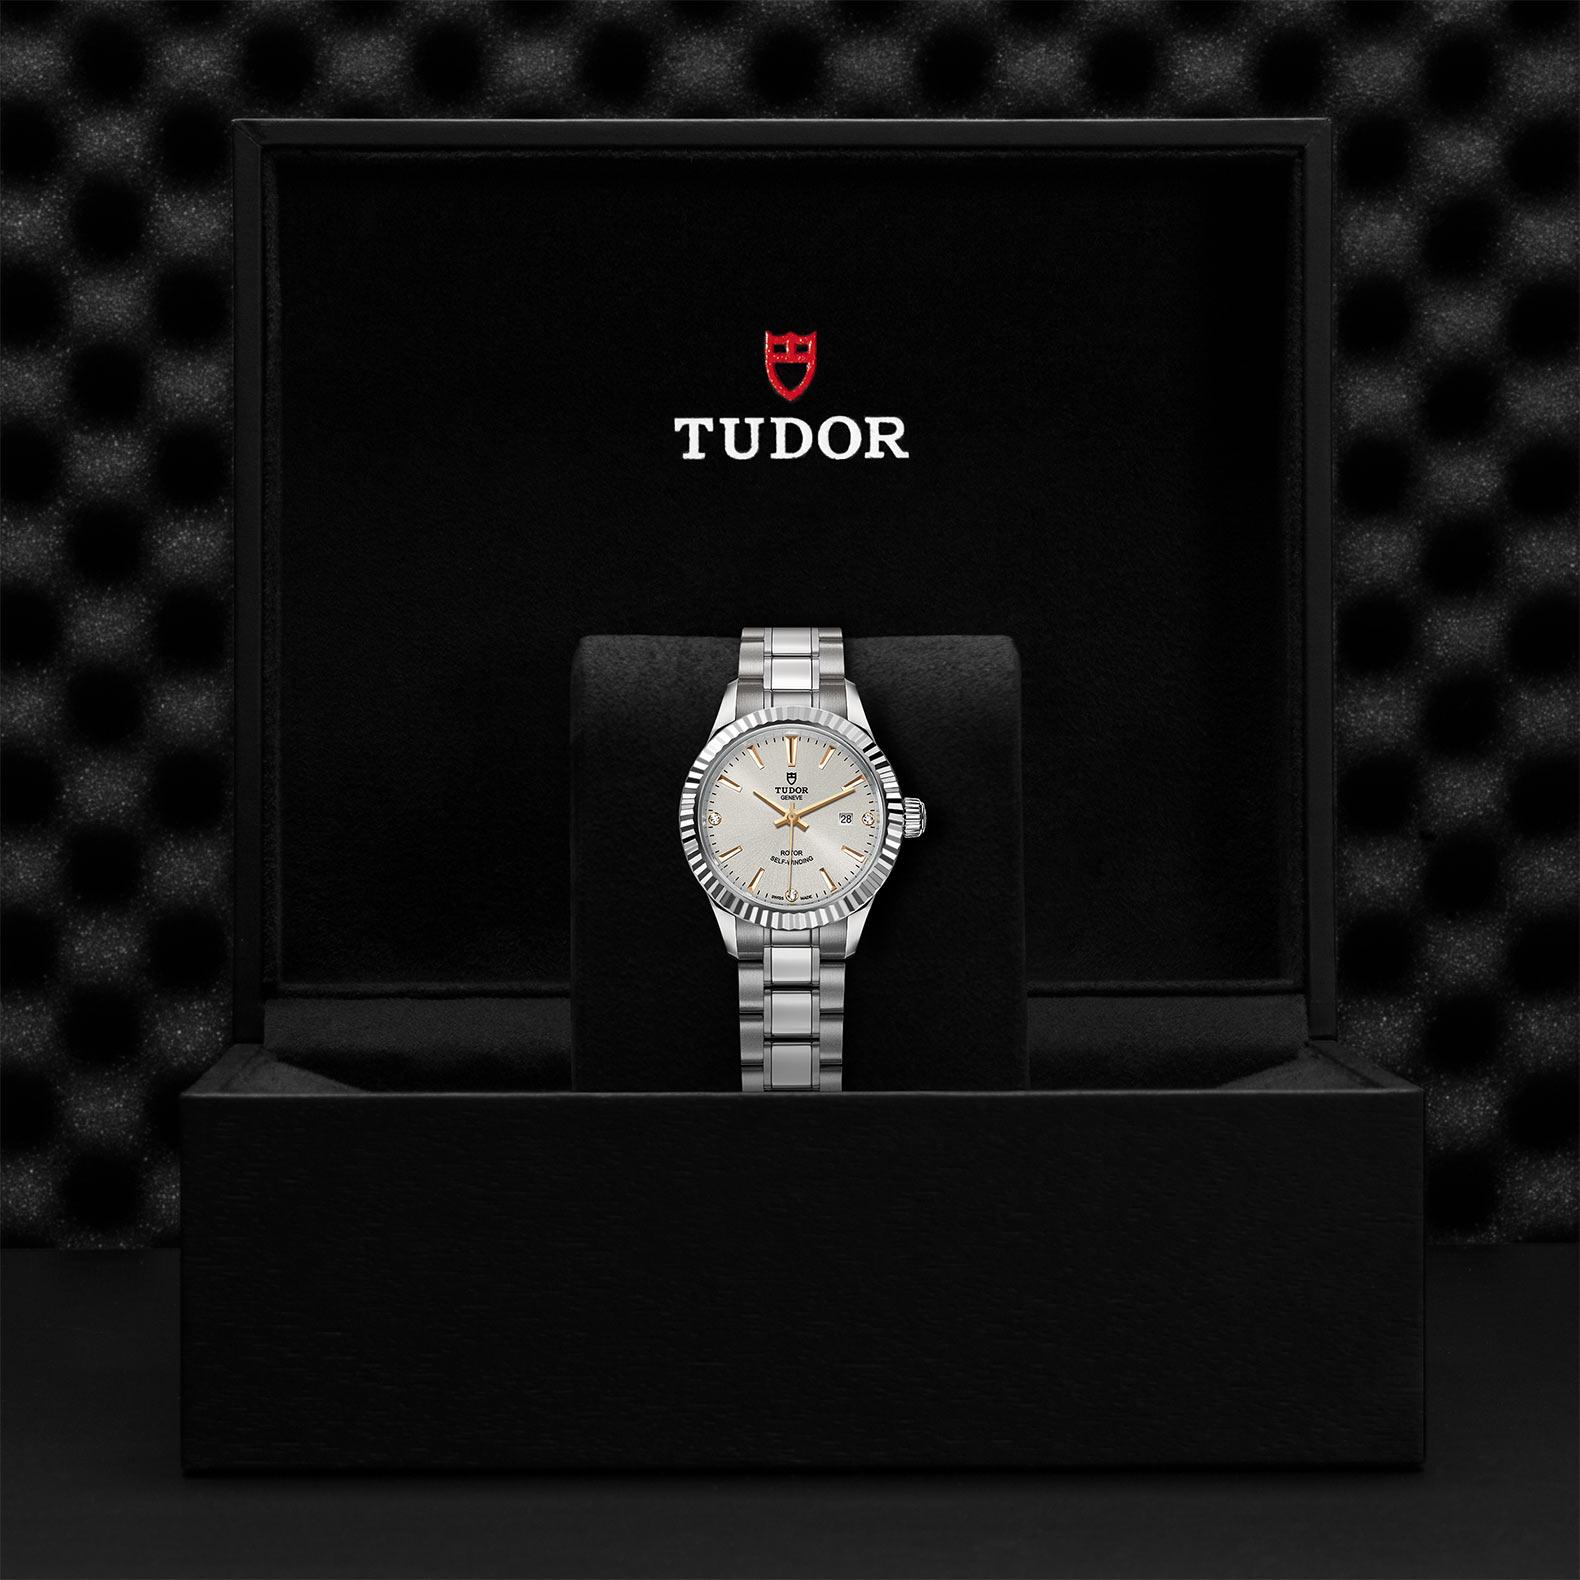 TUDOR Style M12110 0011 Presentation